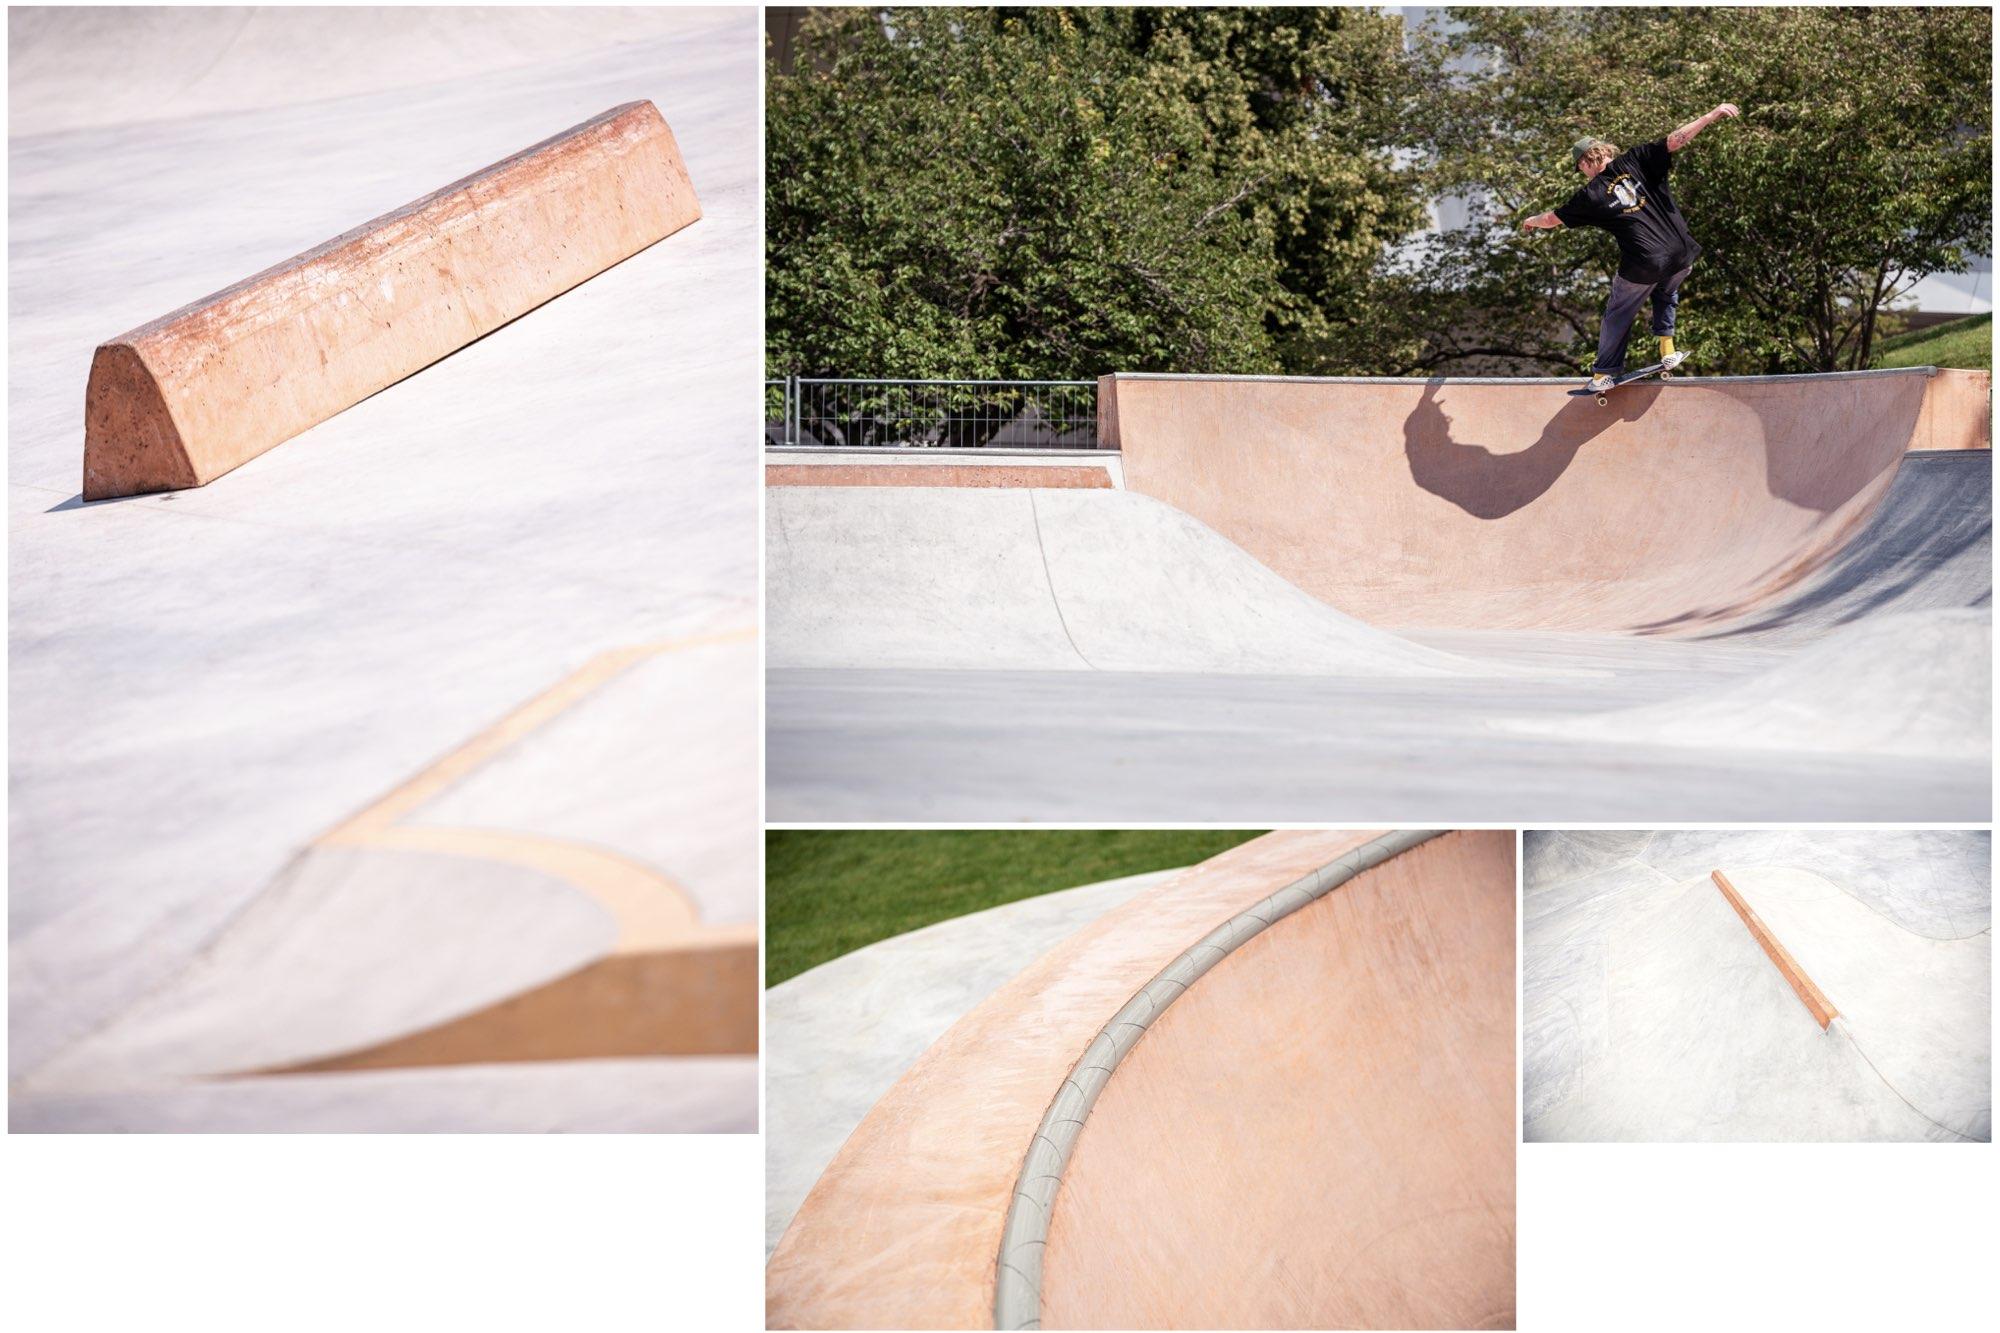 landskate_skatepark_planung_muenchen_stonepark_joscha-aicher